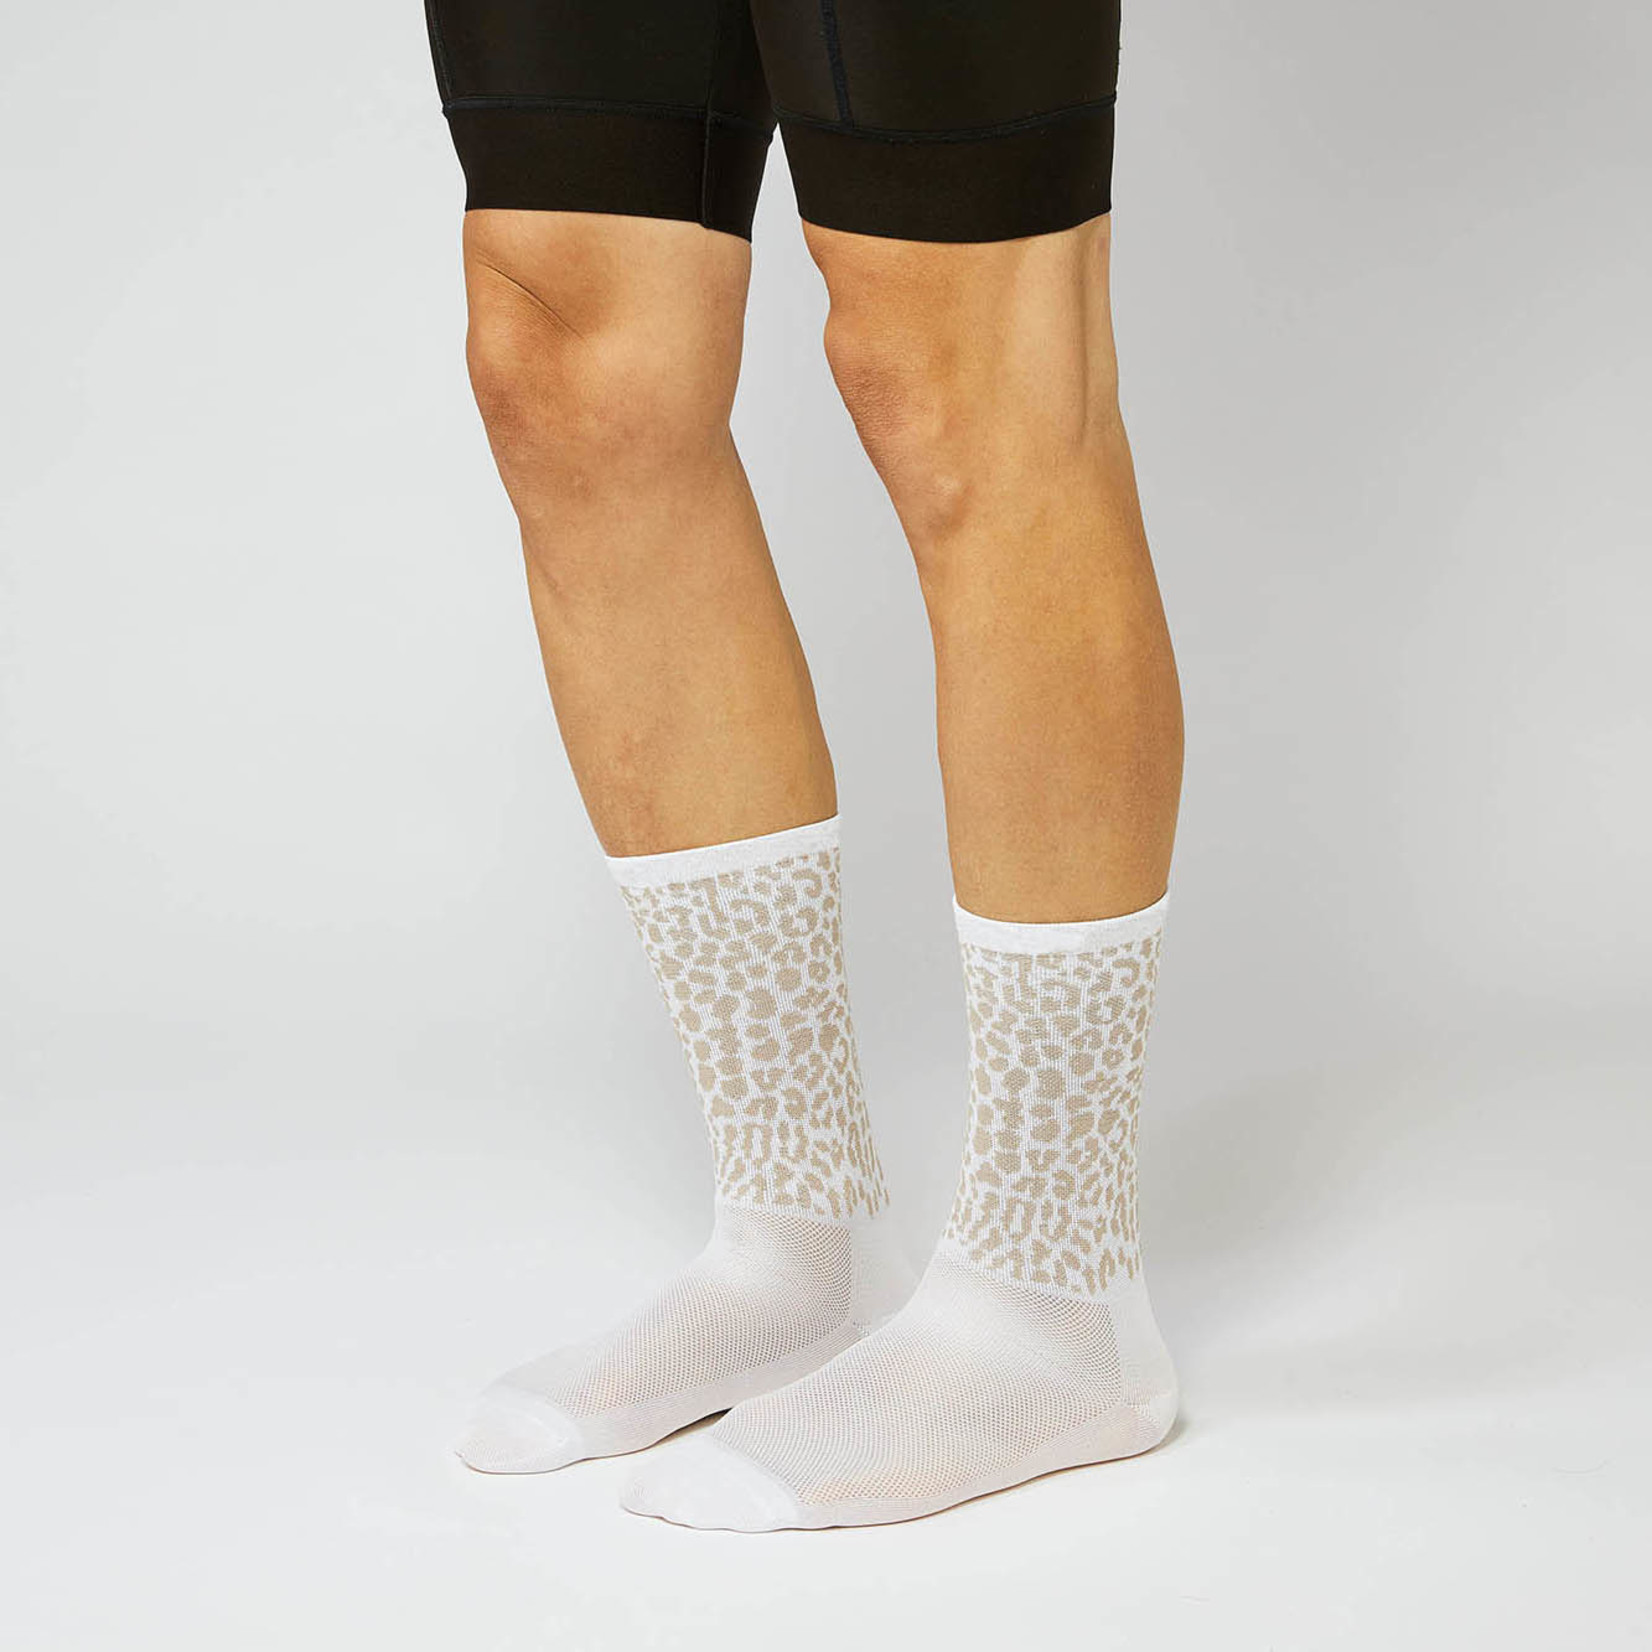 Fingerscrossed FINGERSCROSSED Socks - Giraffe